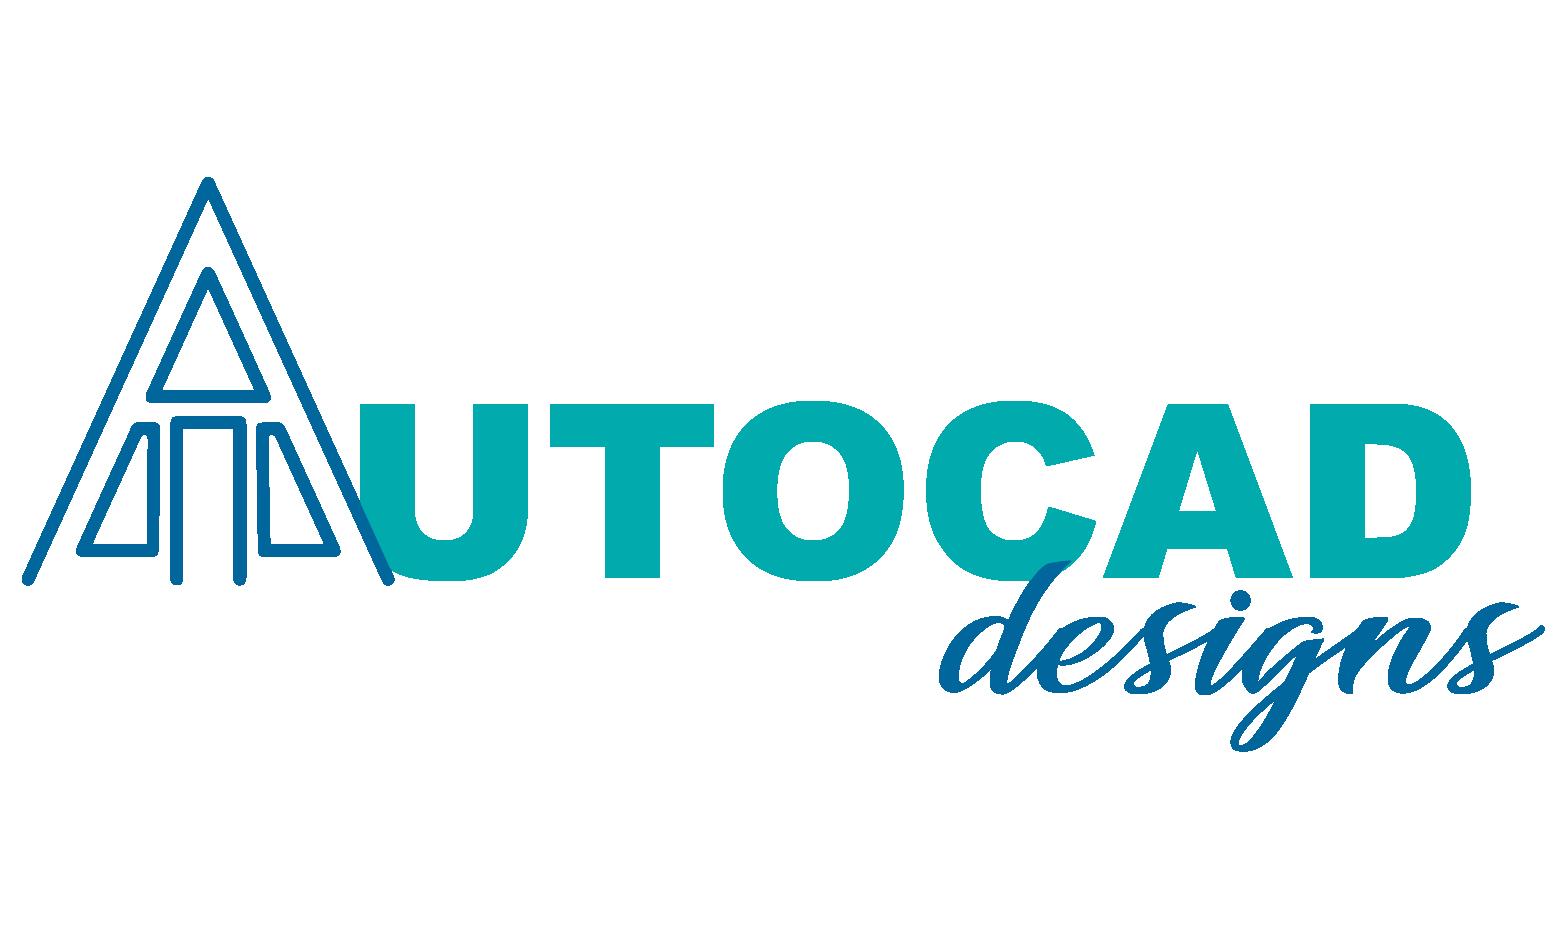 Autocad Designs